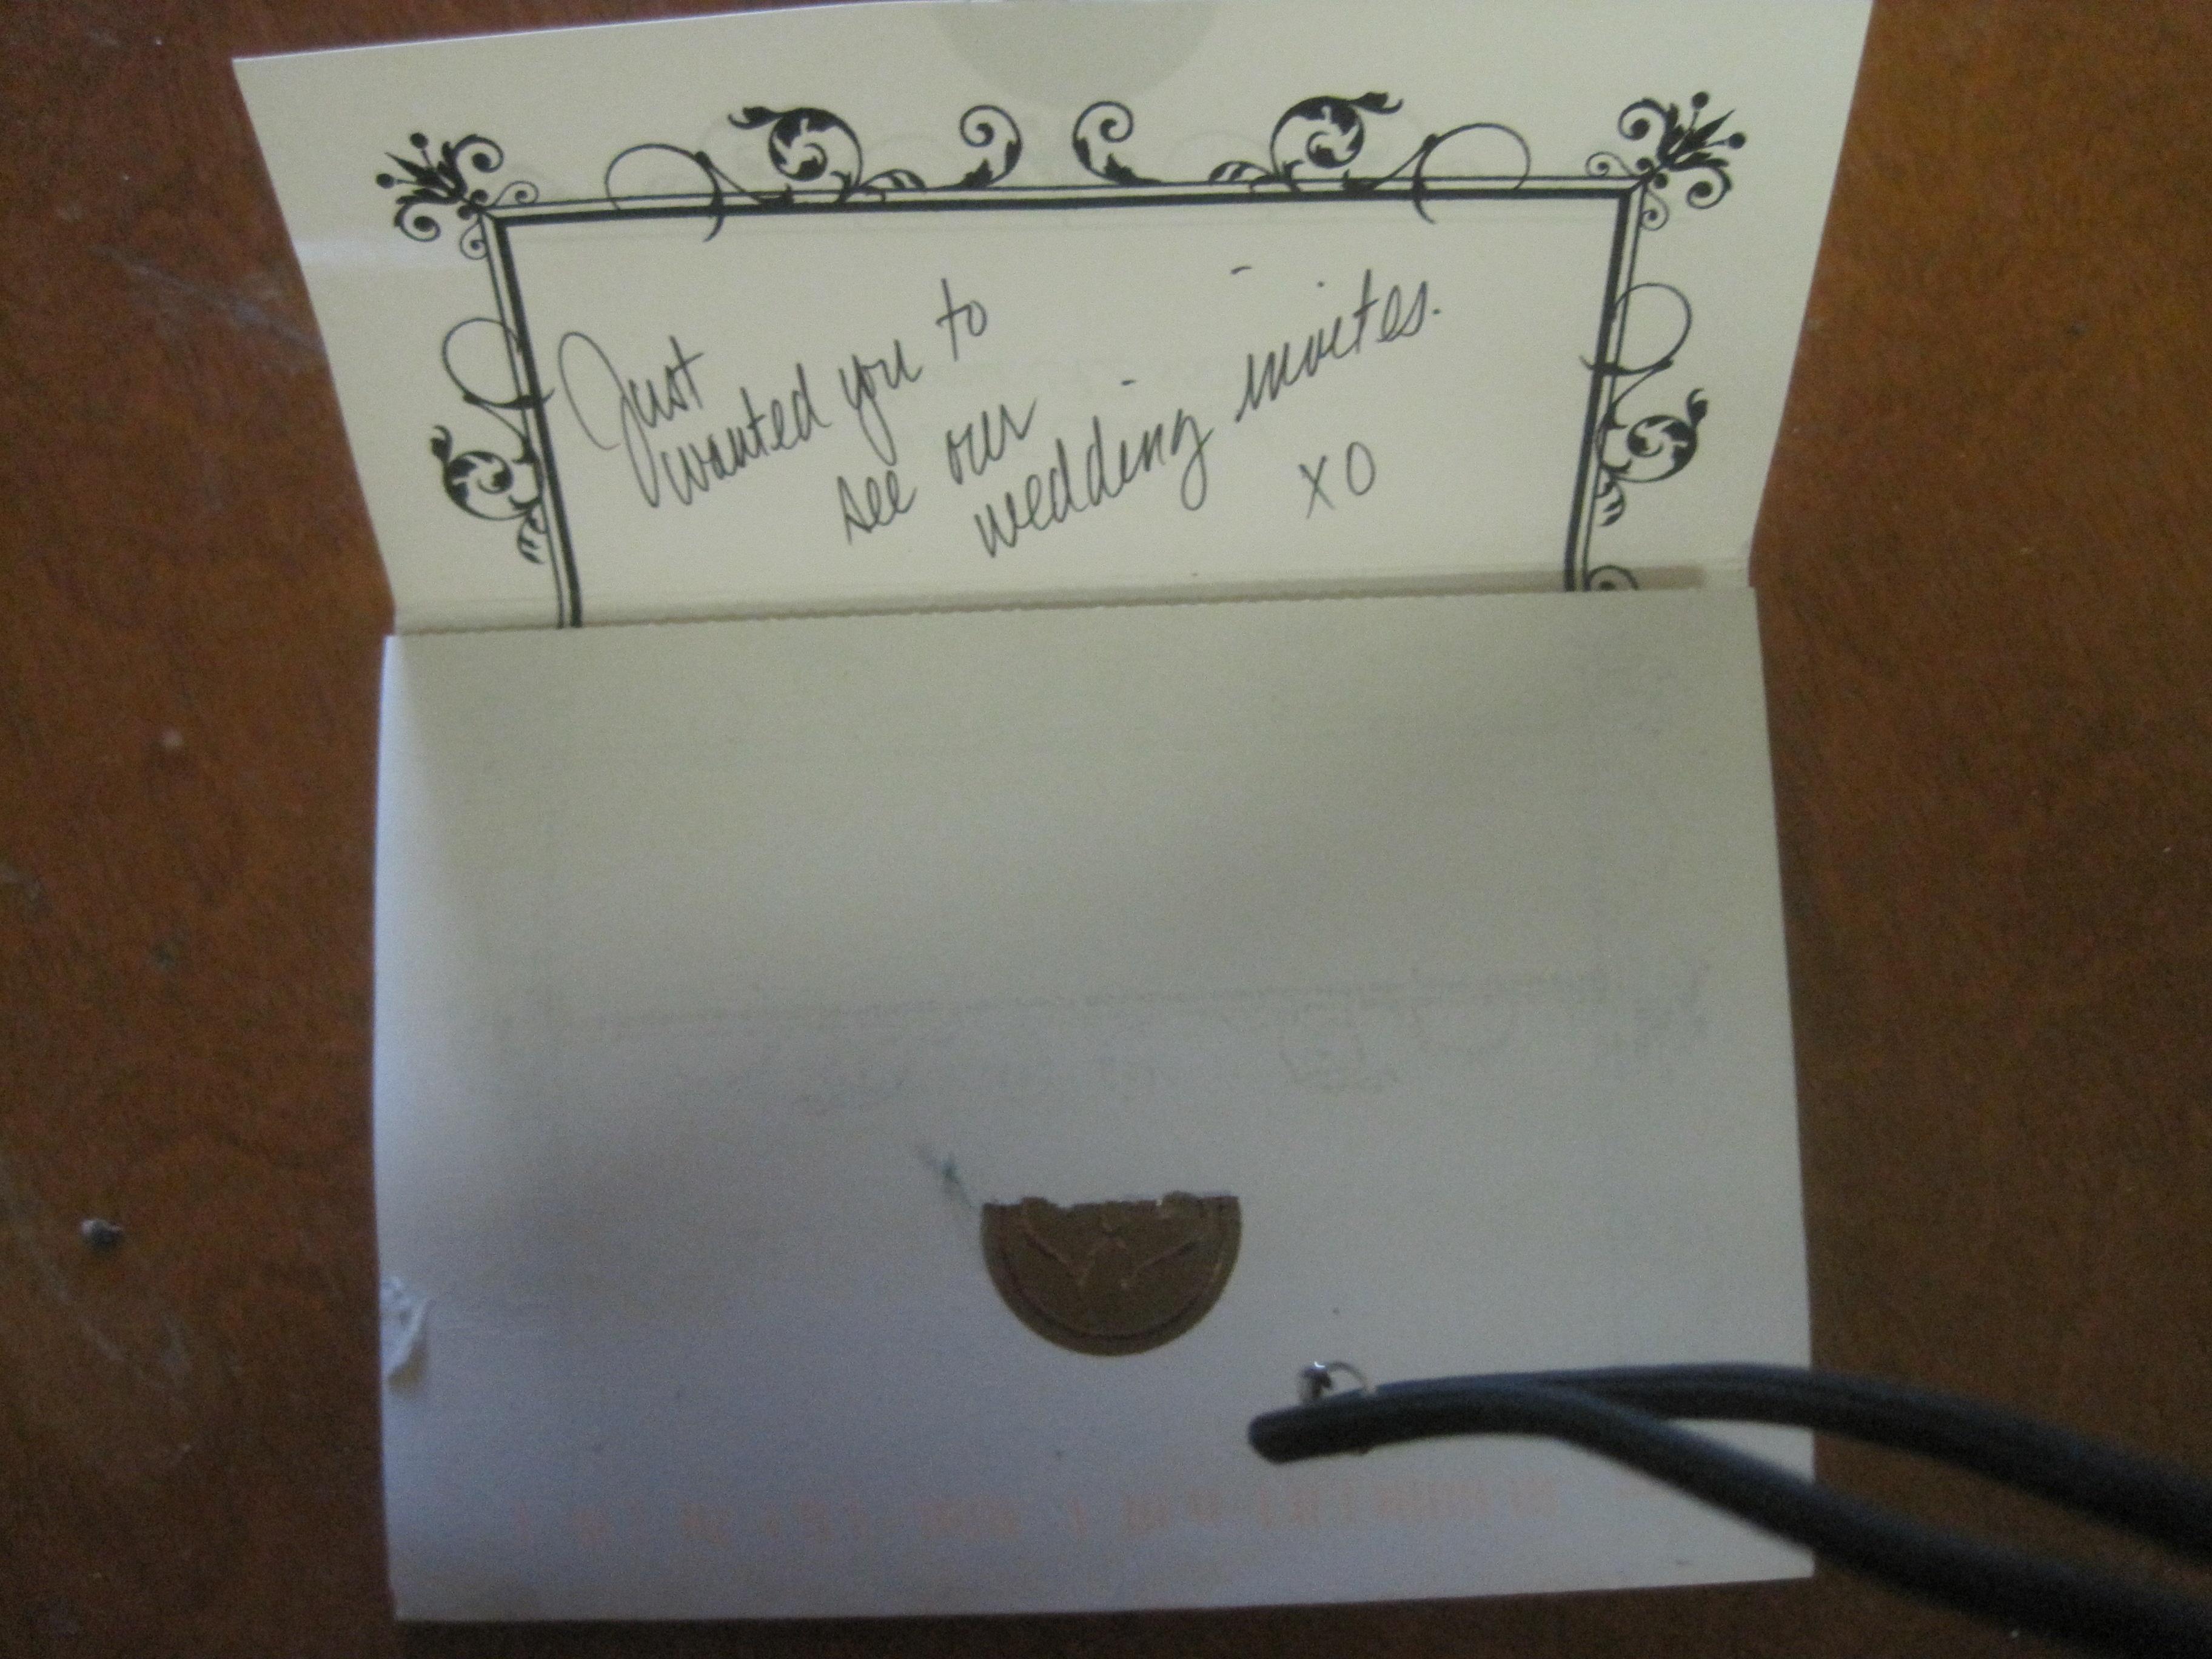 WEDDING INVITATION SENT TO SUPERMARKET - OUR ADDRESSES TOO SIMILAR